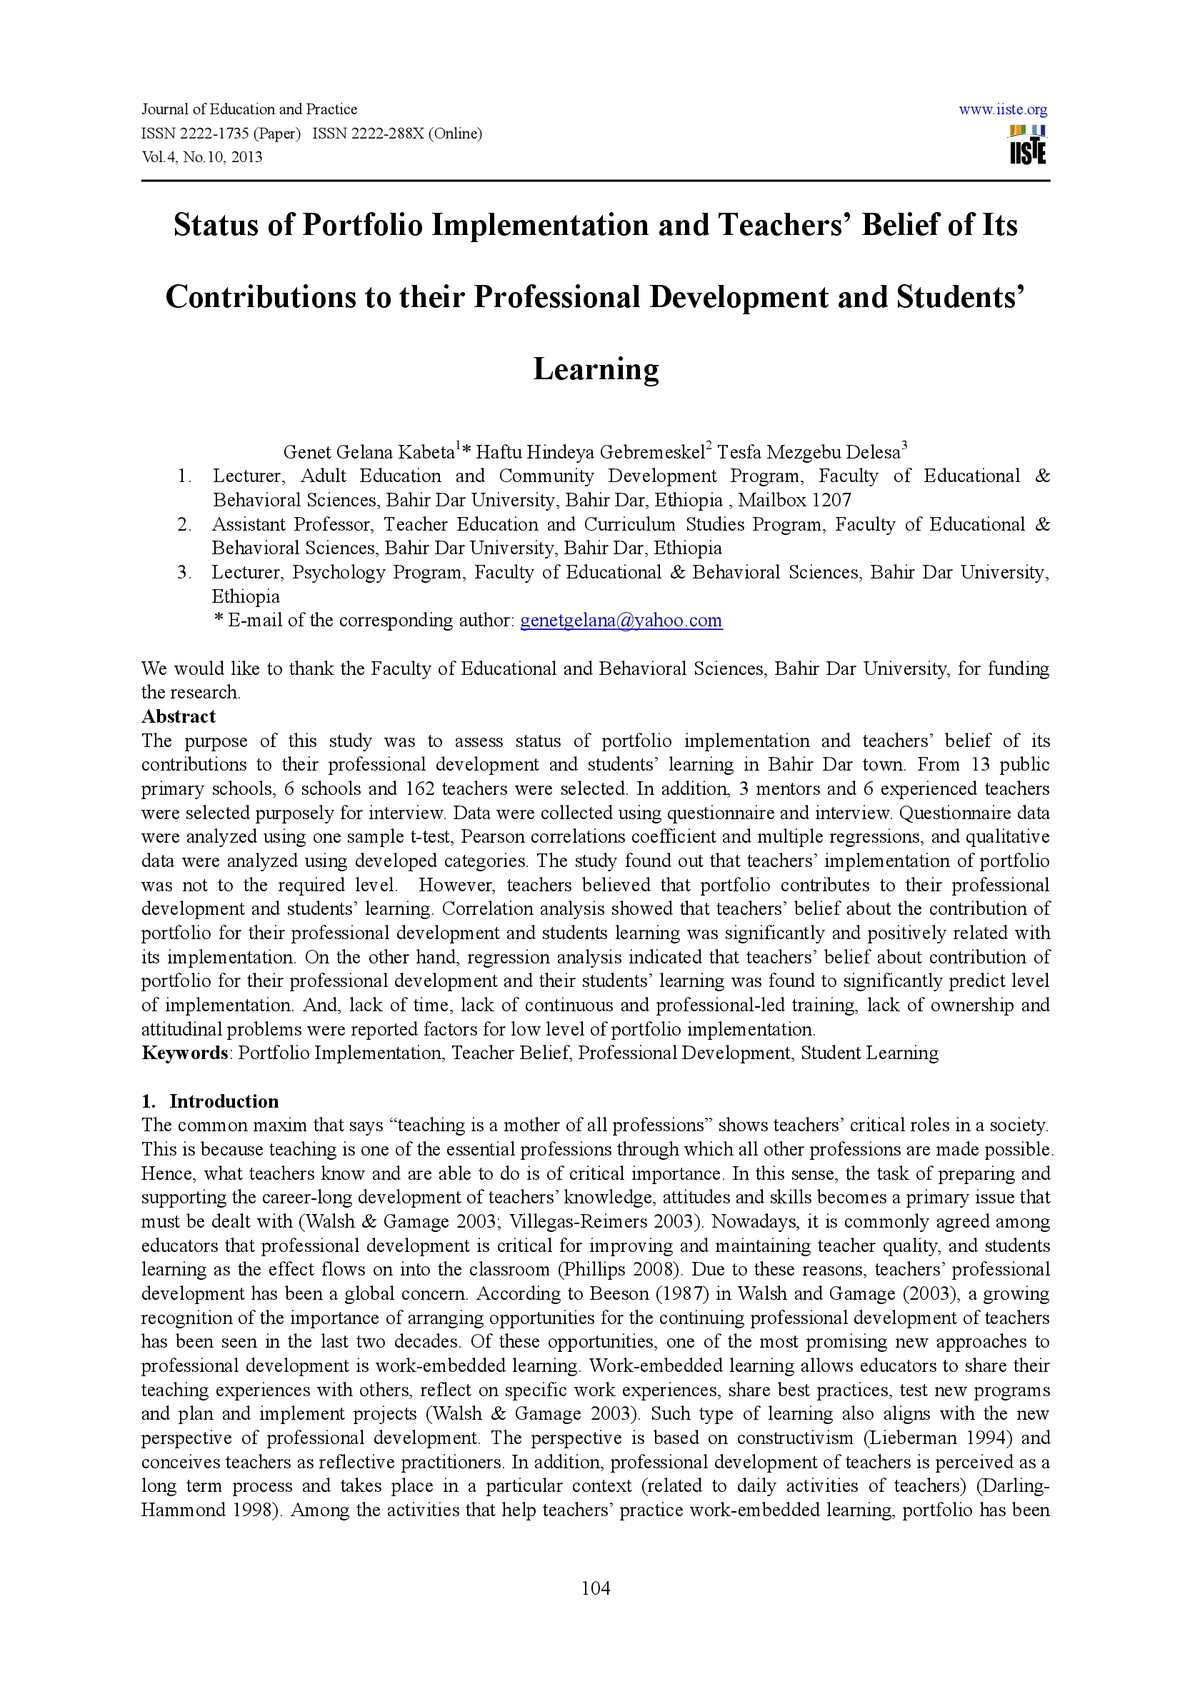 Studies Portfolio Behavior